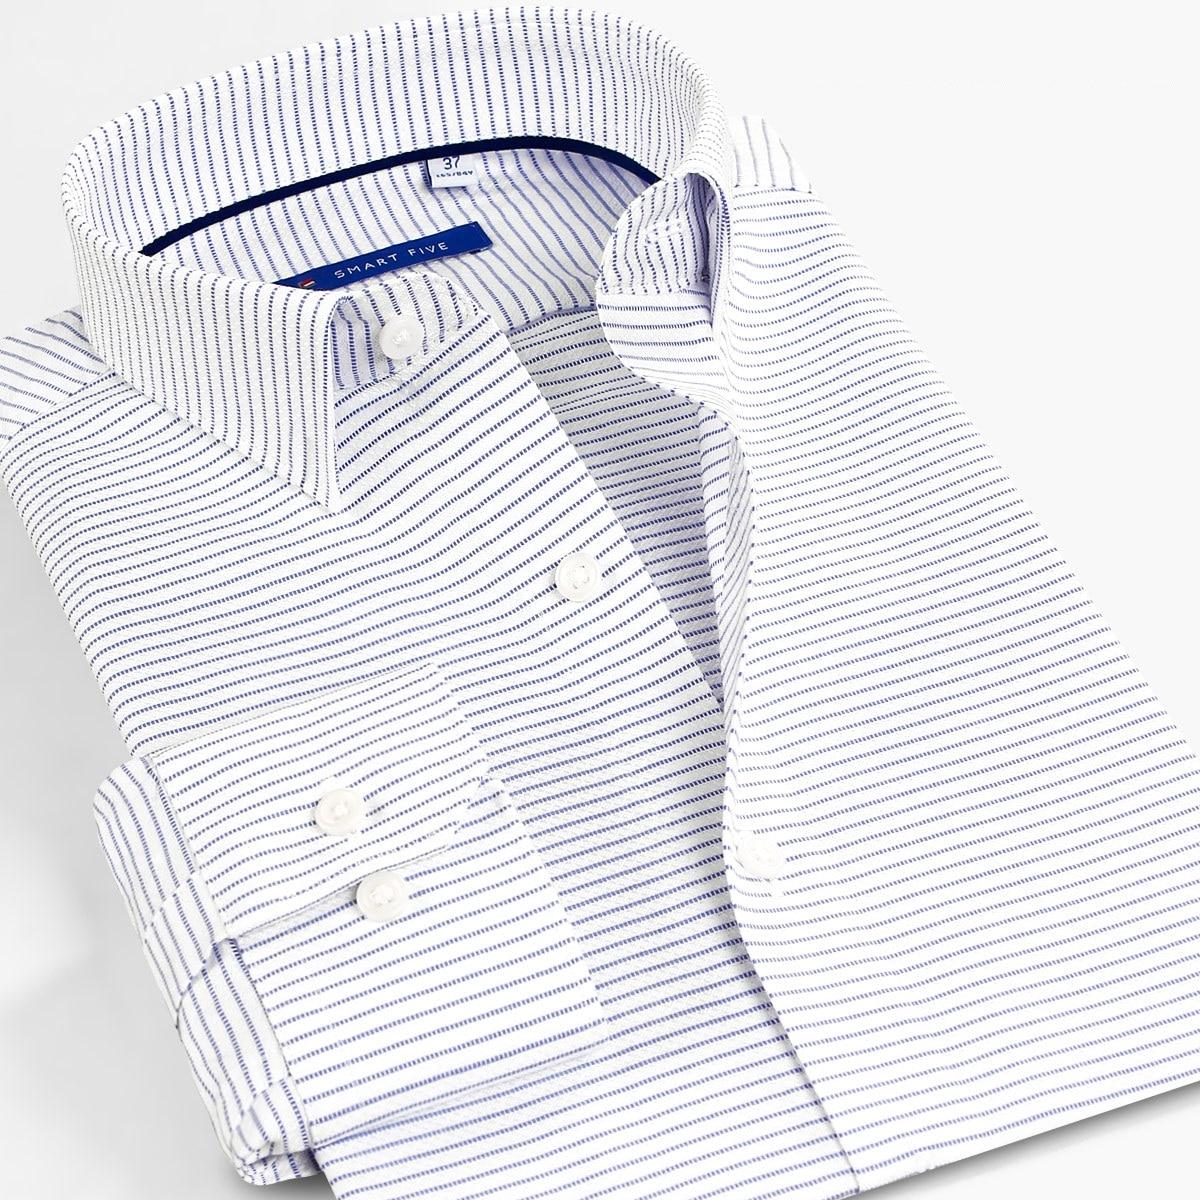 Smart Fünf Kleid Shirts Gestreiften Männer Shirts 5xl Baumwolle Langarm Formalen Shirts für Männer Büro Business camisa masculina-in Hemden aus Herrenbekleidung bei  Gruppe 1